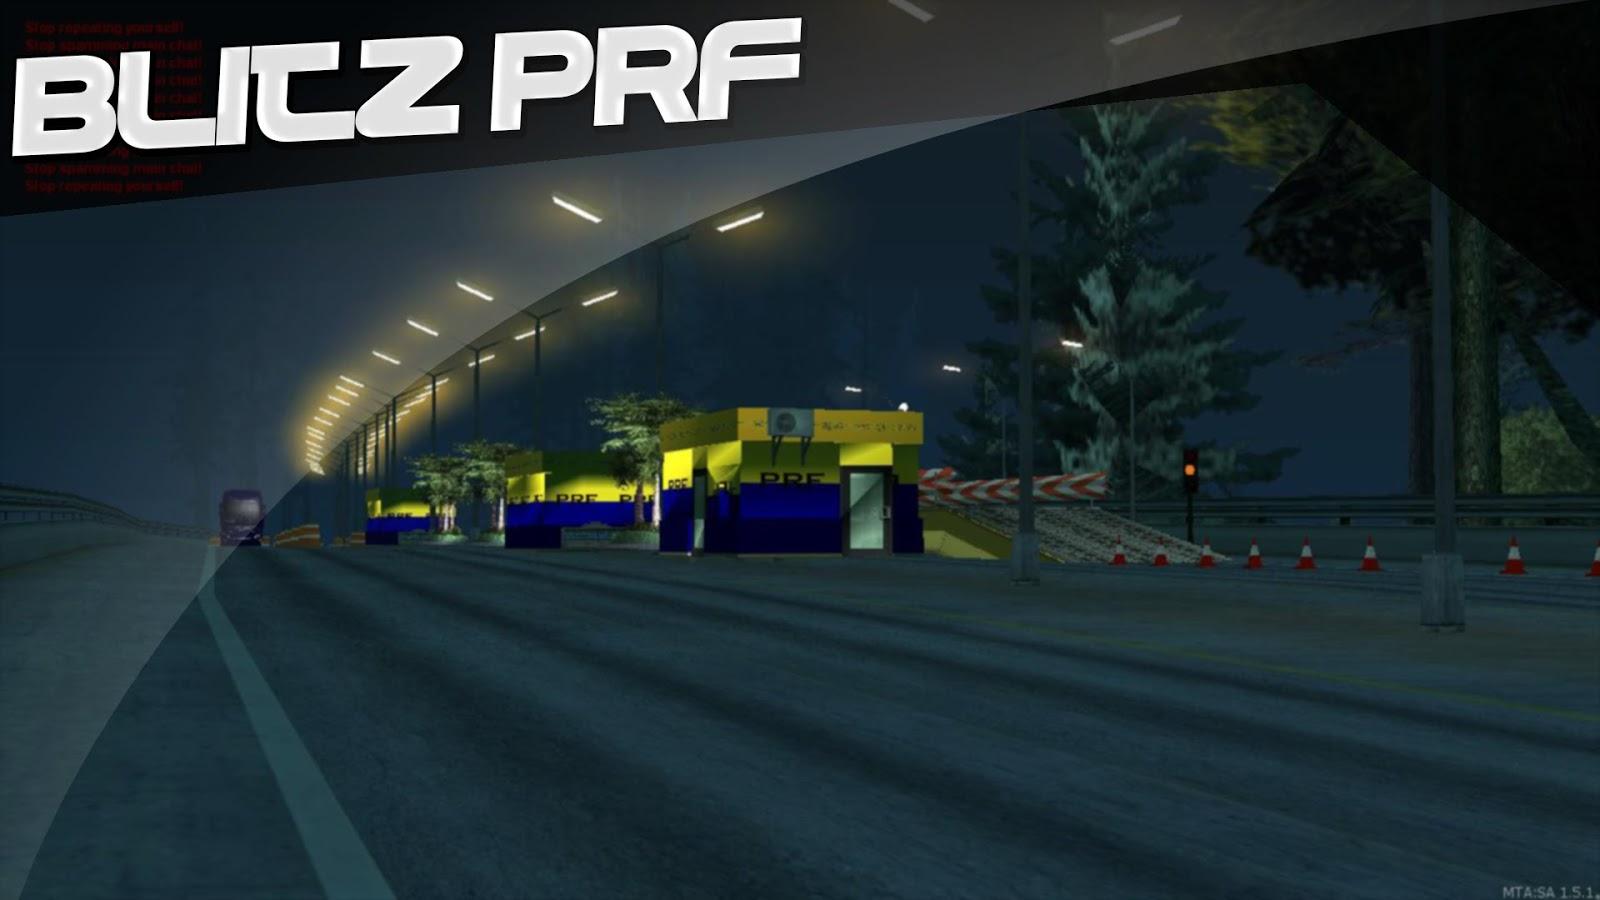 Gta 5 online novo carro freecrawler natildeo lanccedilado test039s 597000 - 3 7